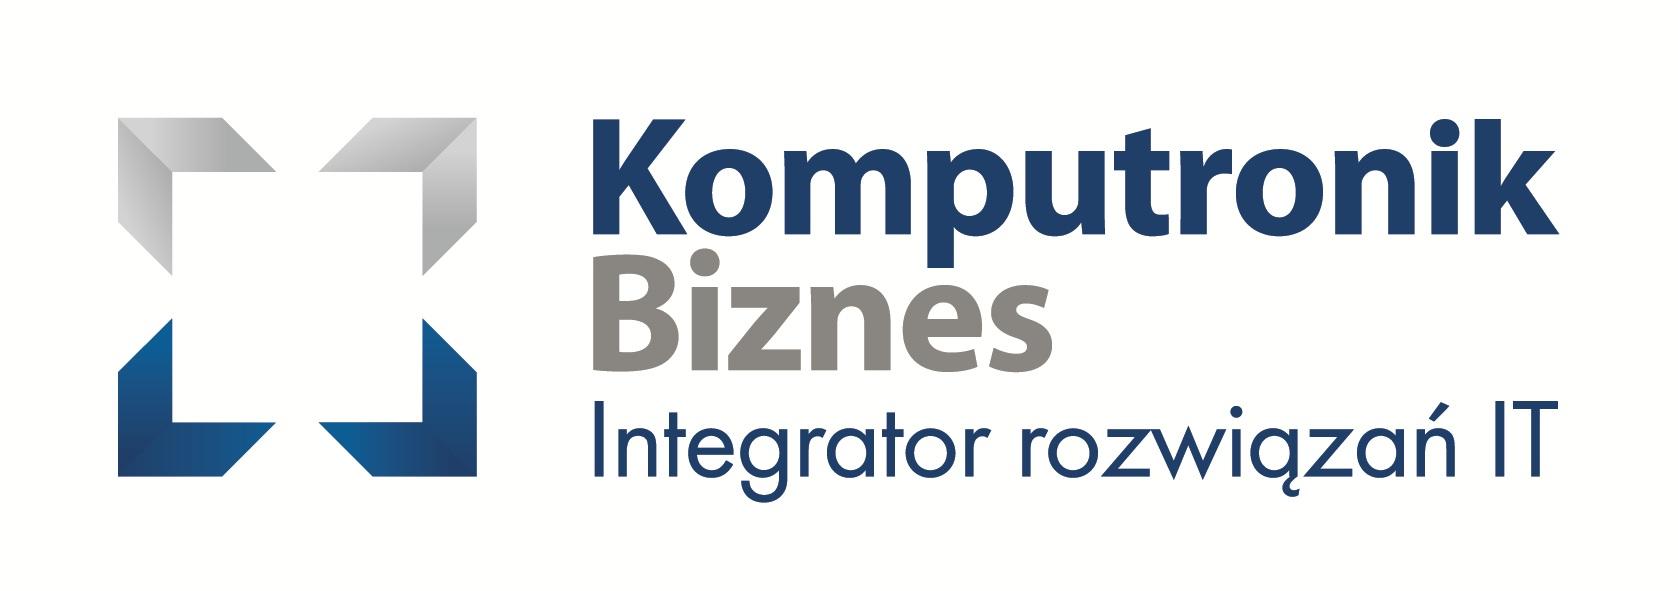 Znalezione obrazy dla zapytania komputronik biznes logo